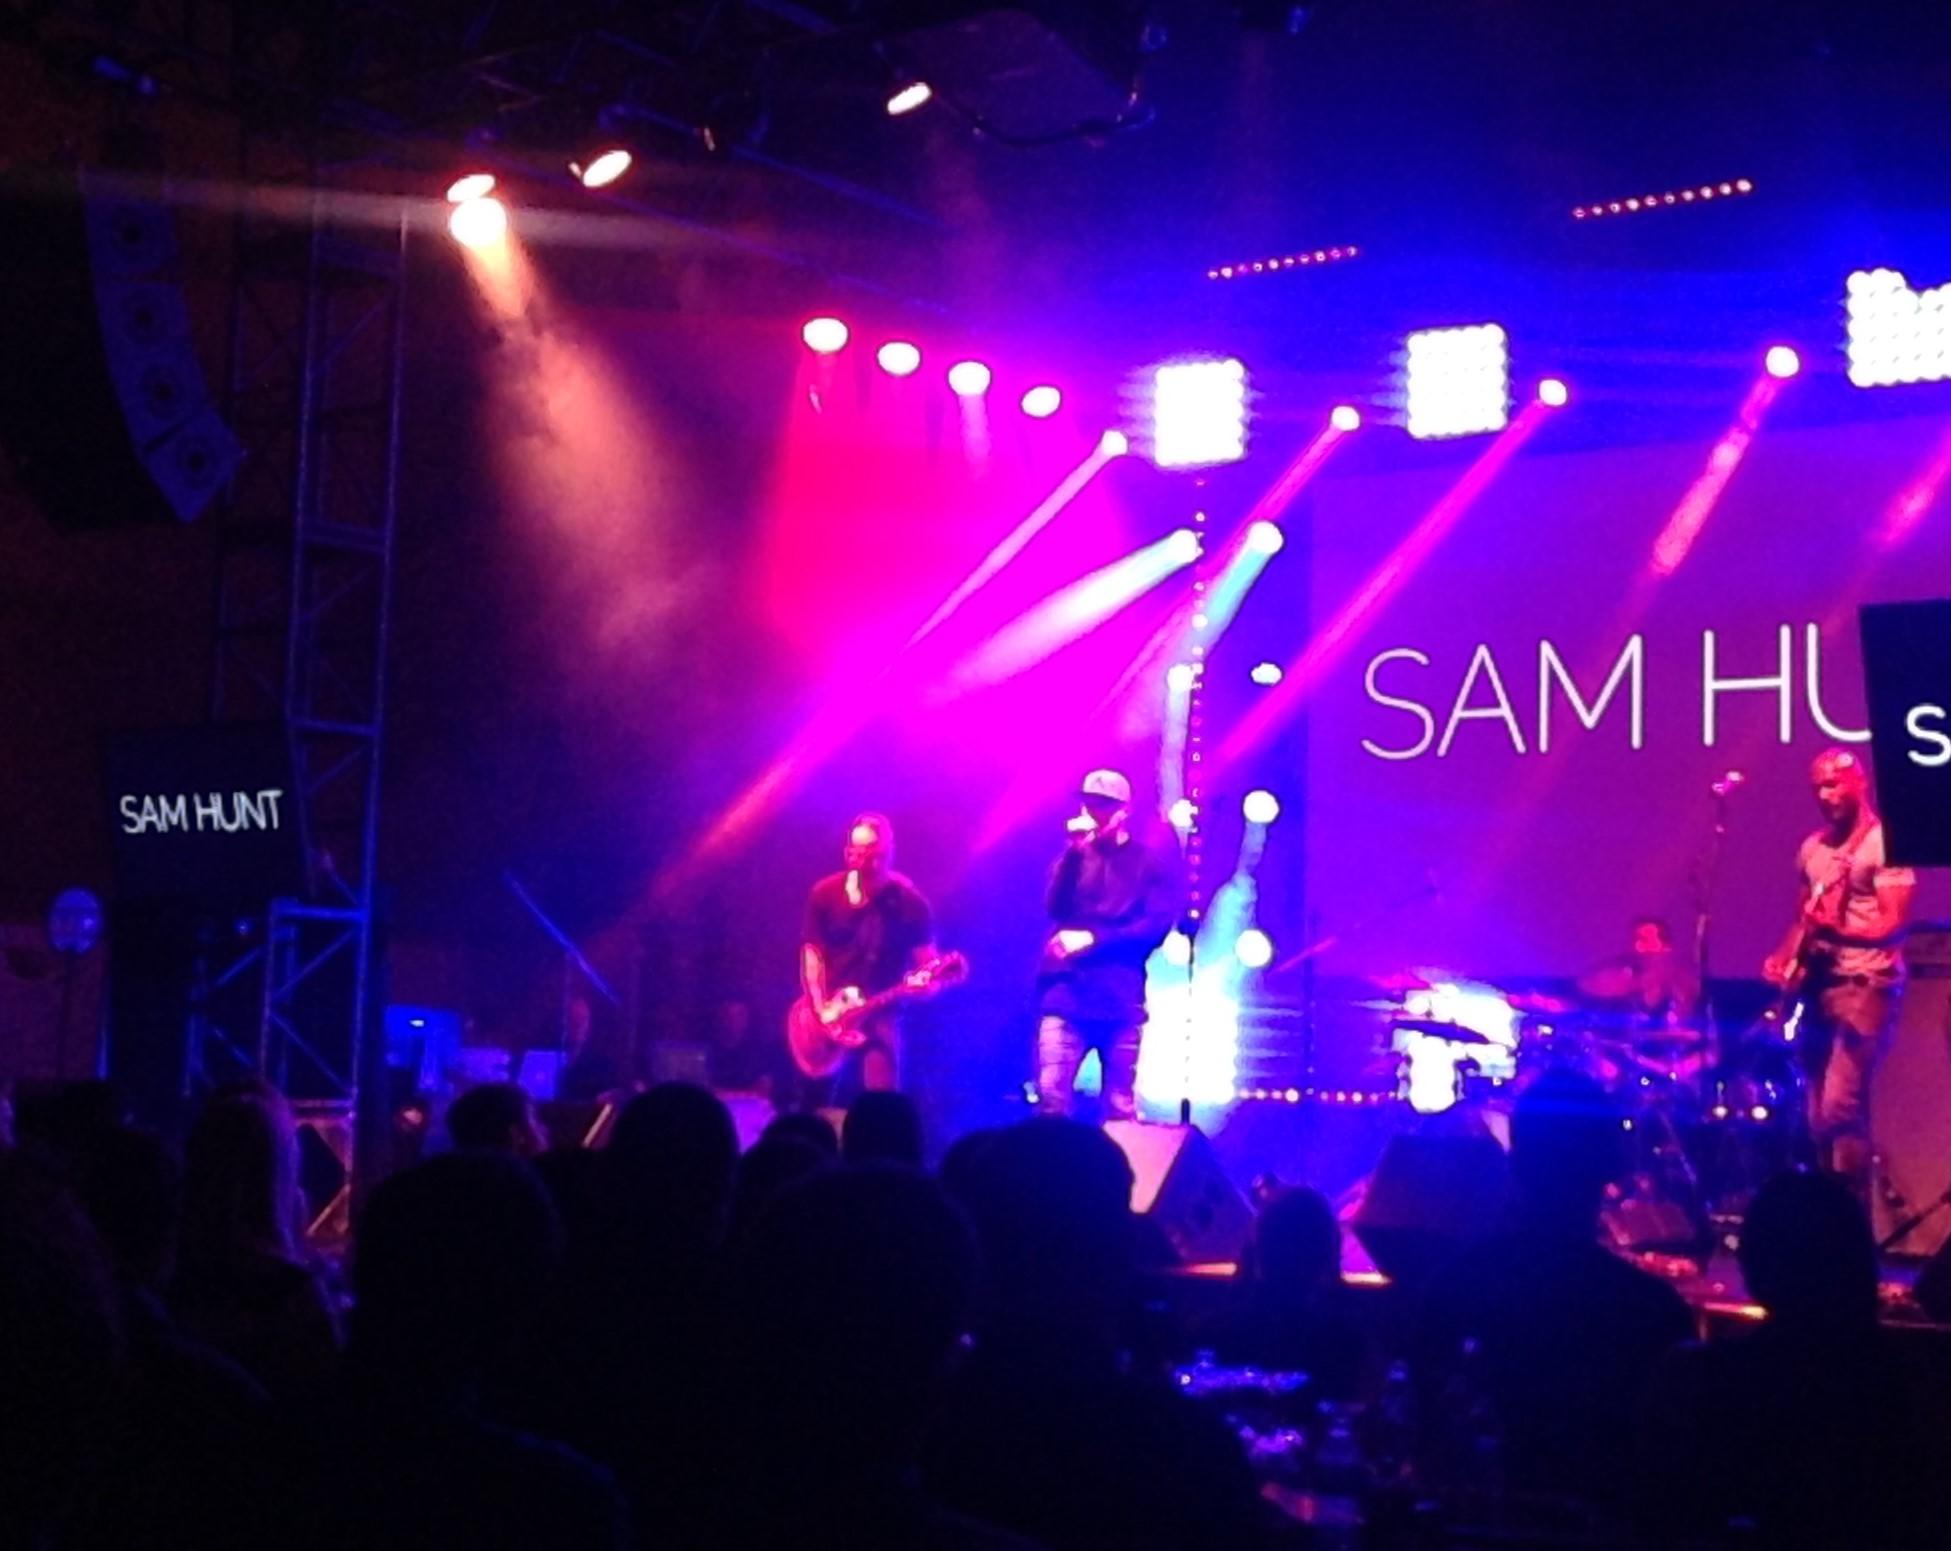 Sam hunt concert dates